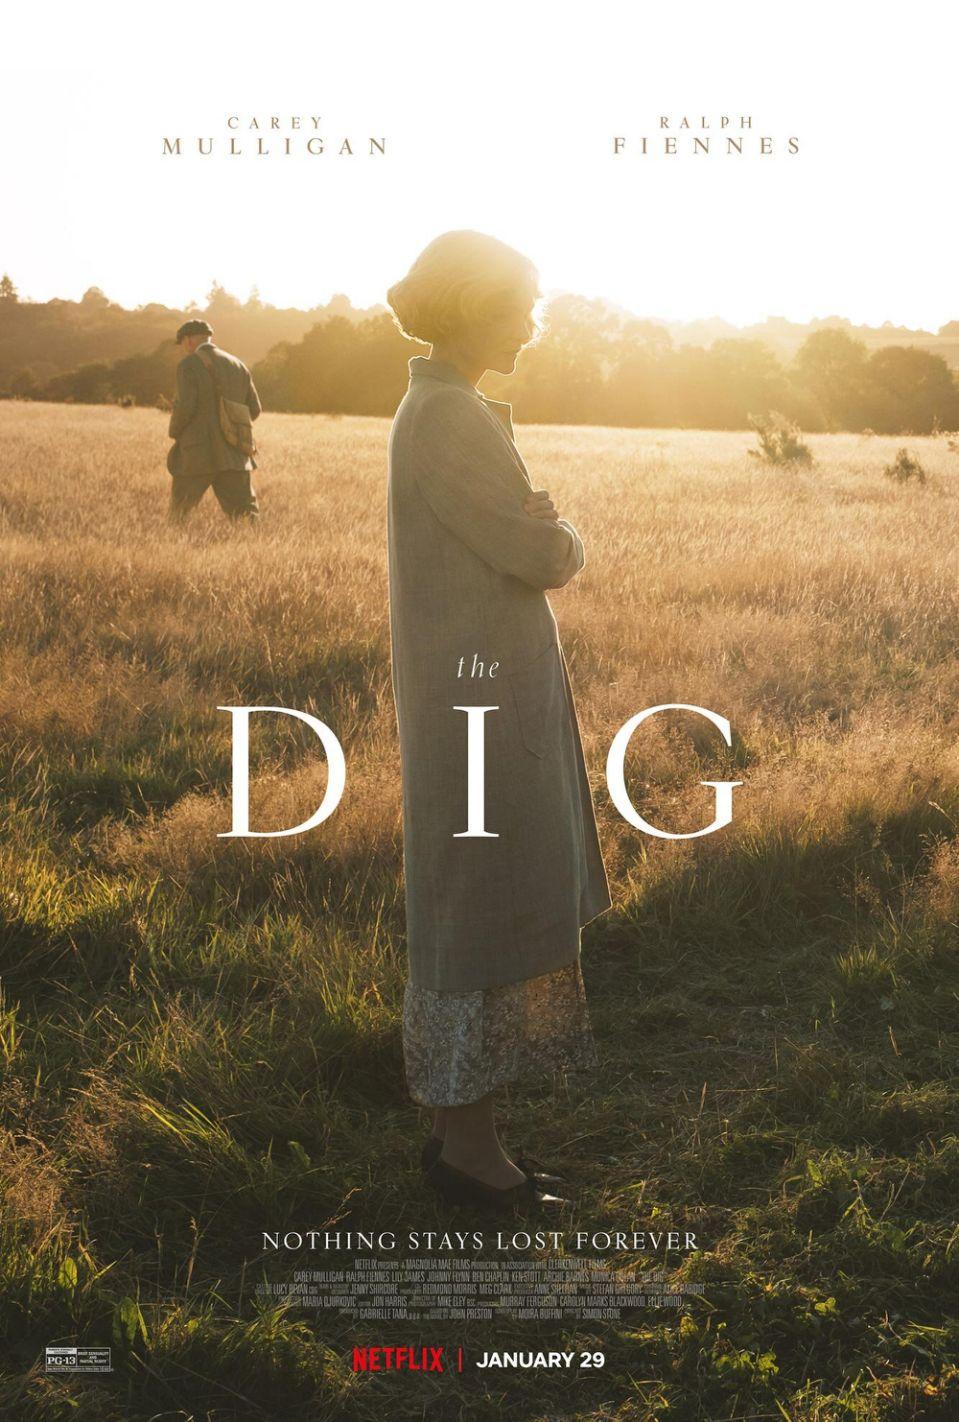 Film Drama Perang The Dig Yang Dibintangi Oleh Carey Mulligan & Ralph Fiennes